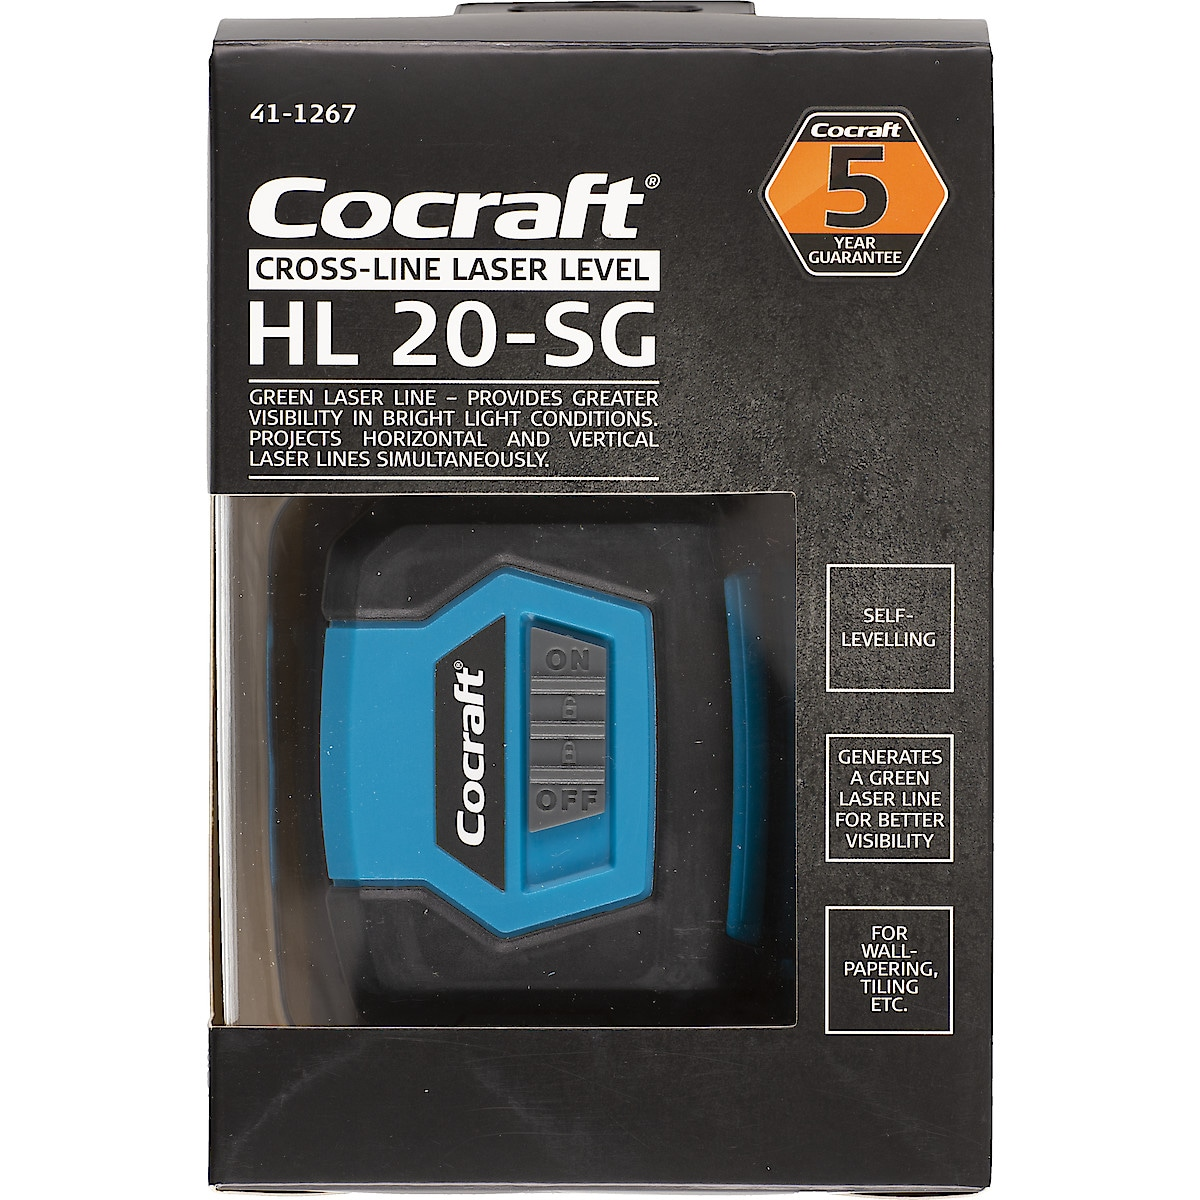 Krysslaser Cocraft HL 20-SG